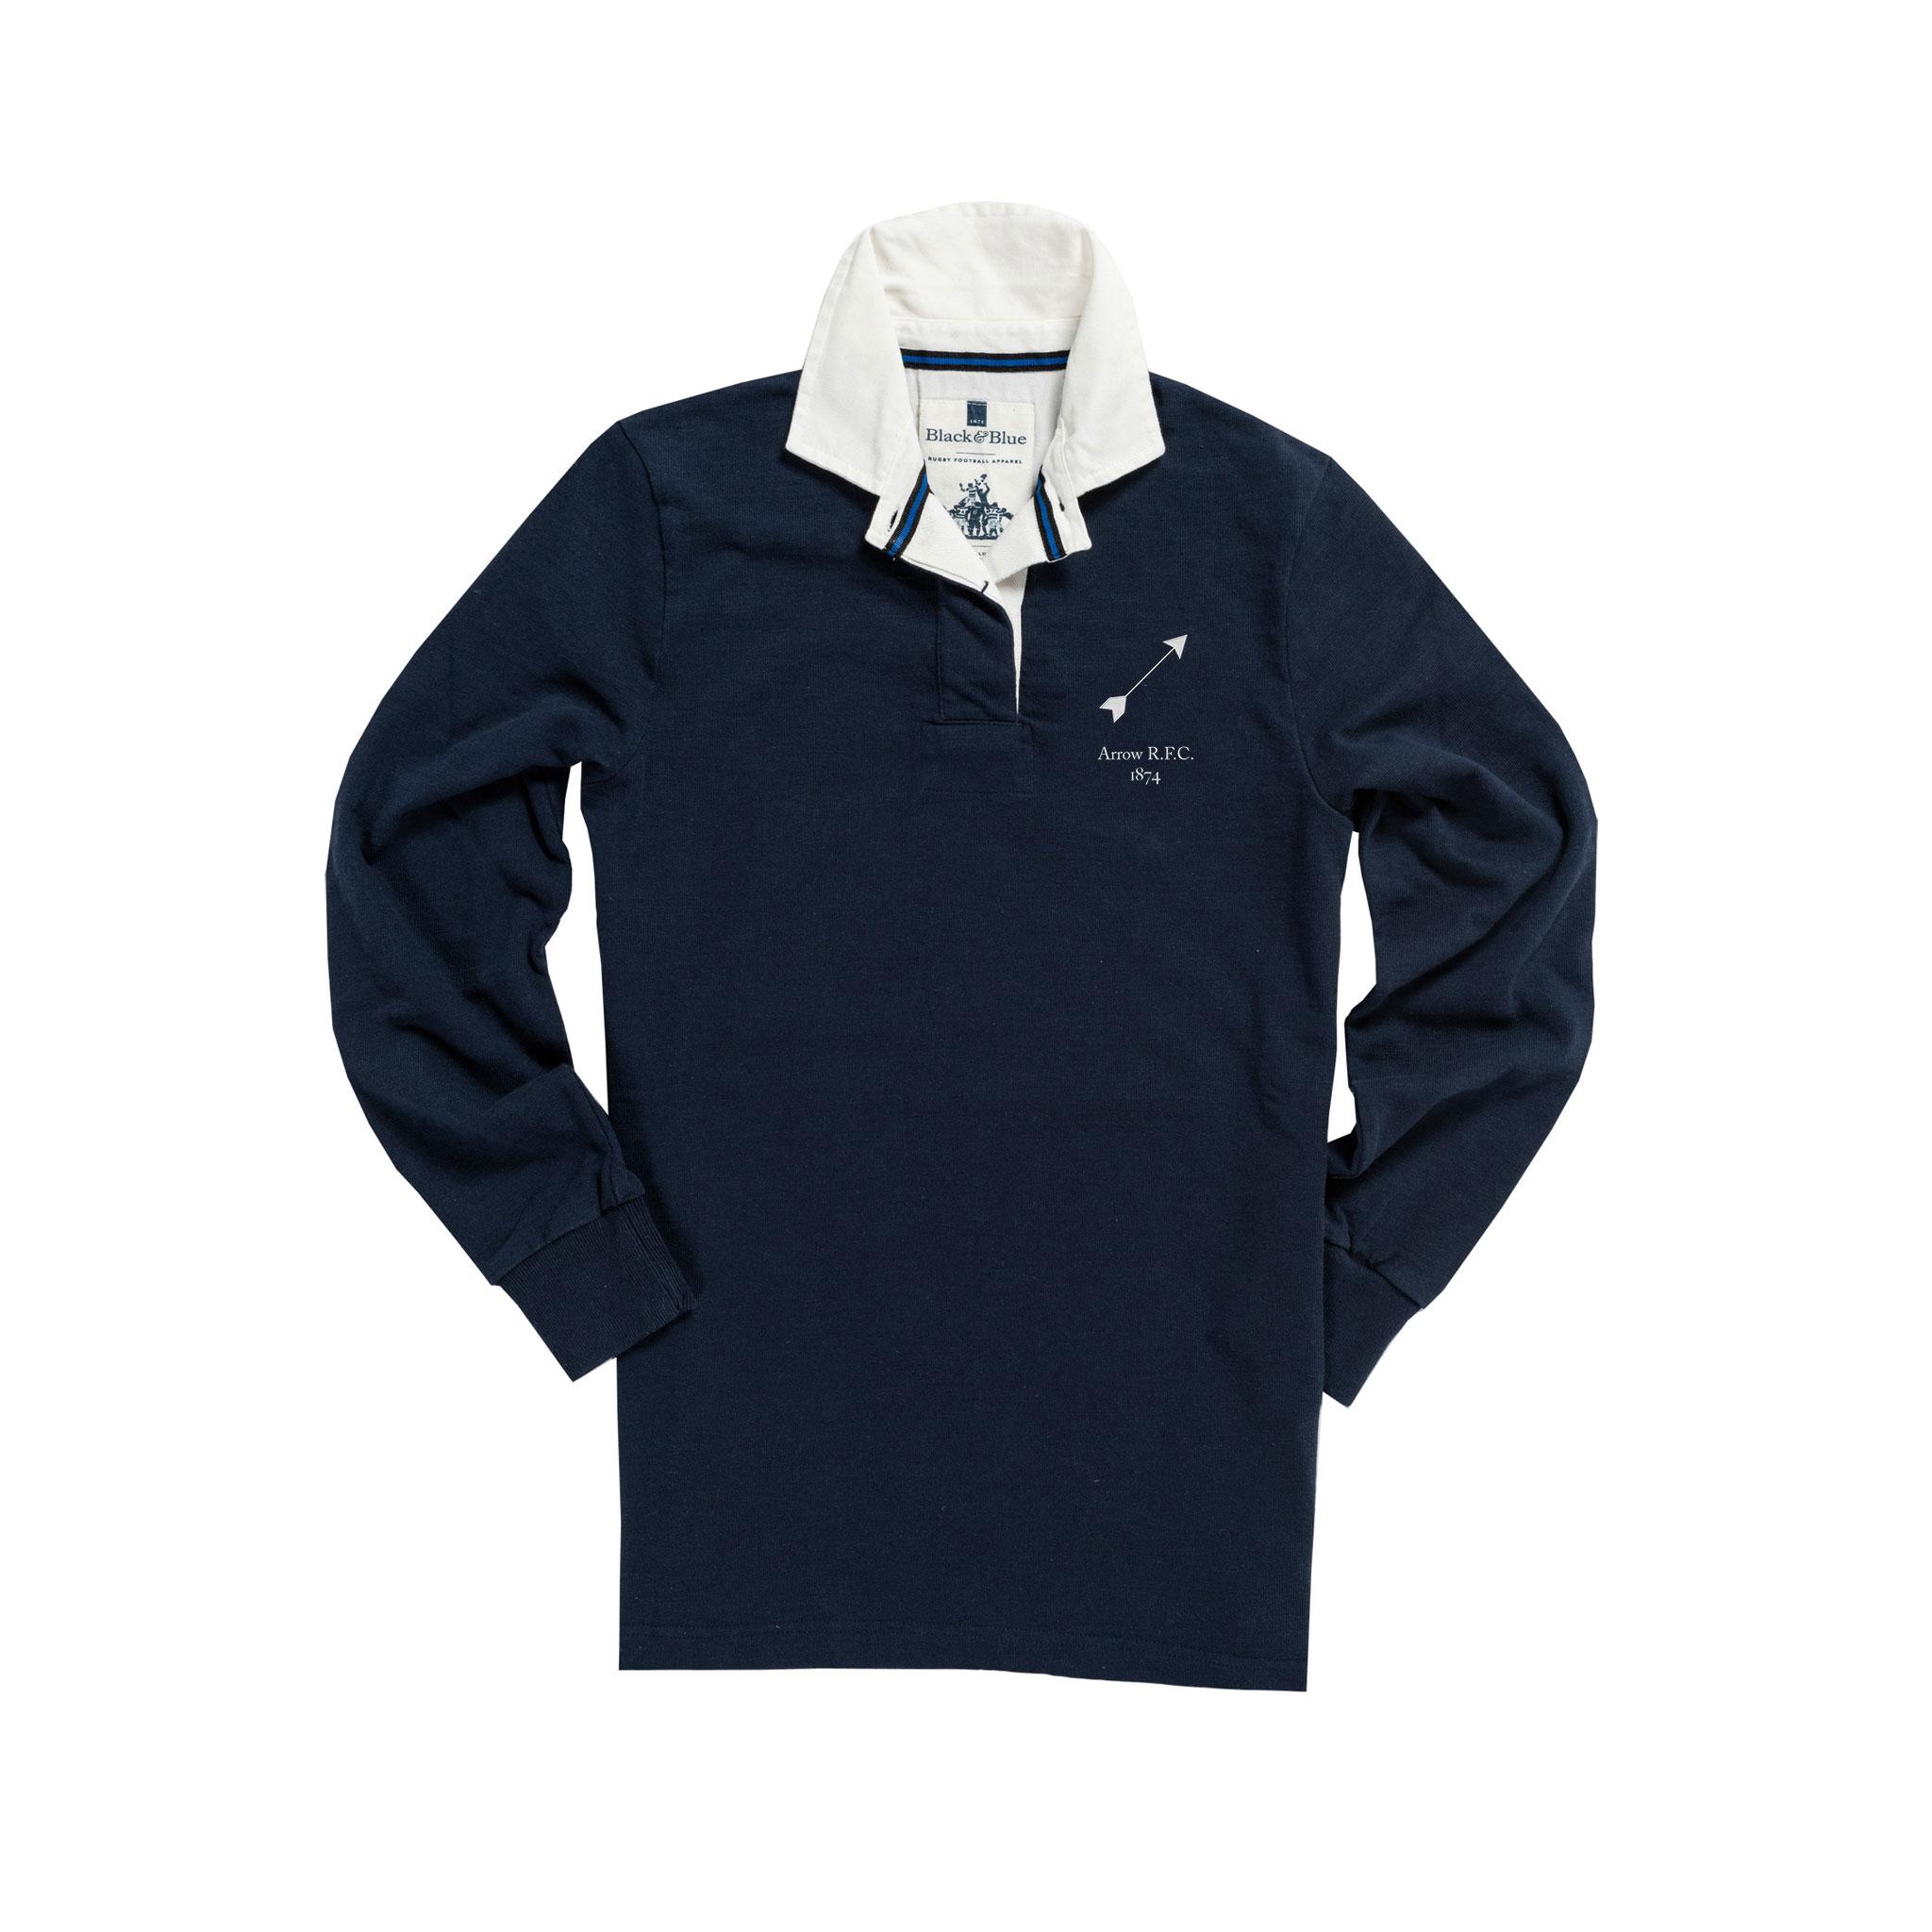 Arrow 1874 Women's Rugby Shirt_Front